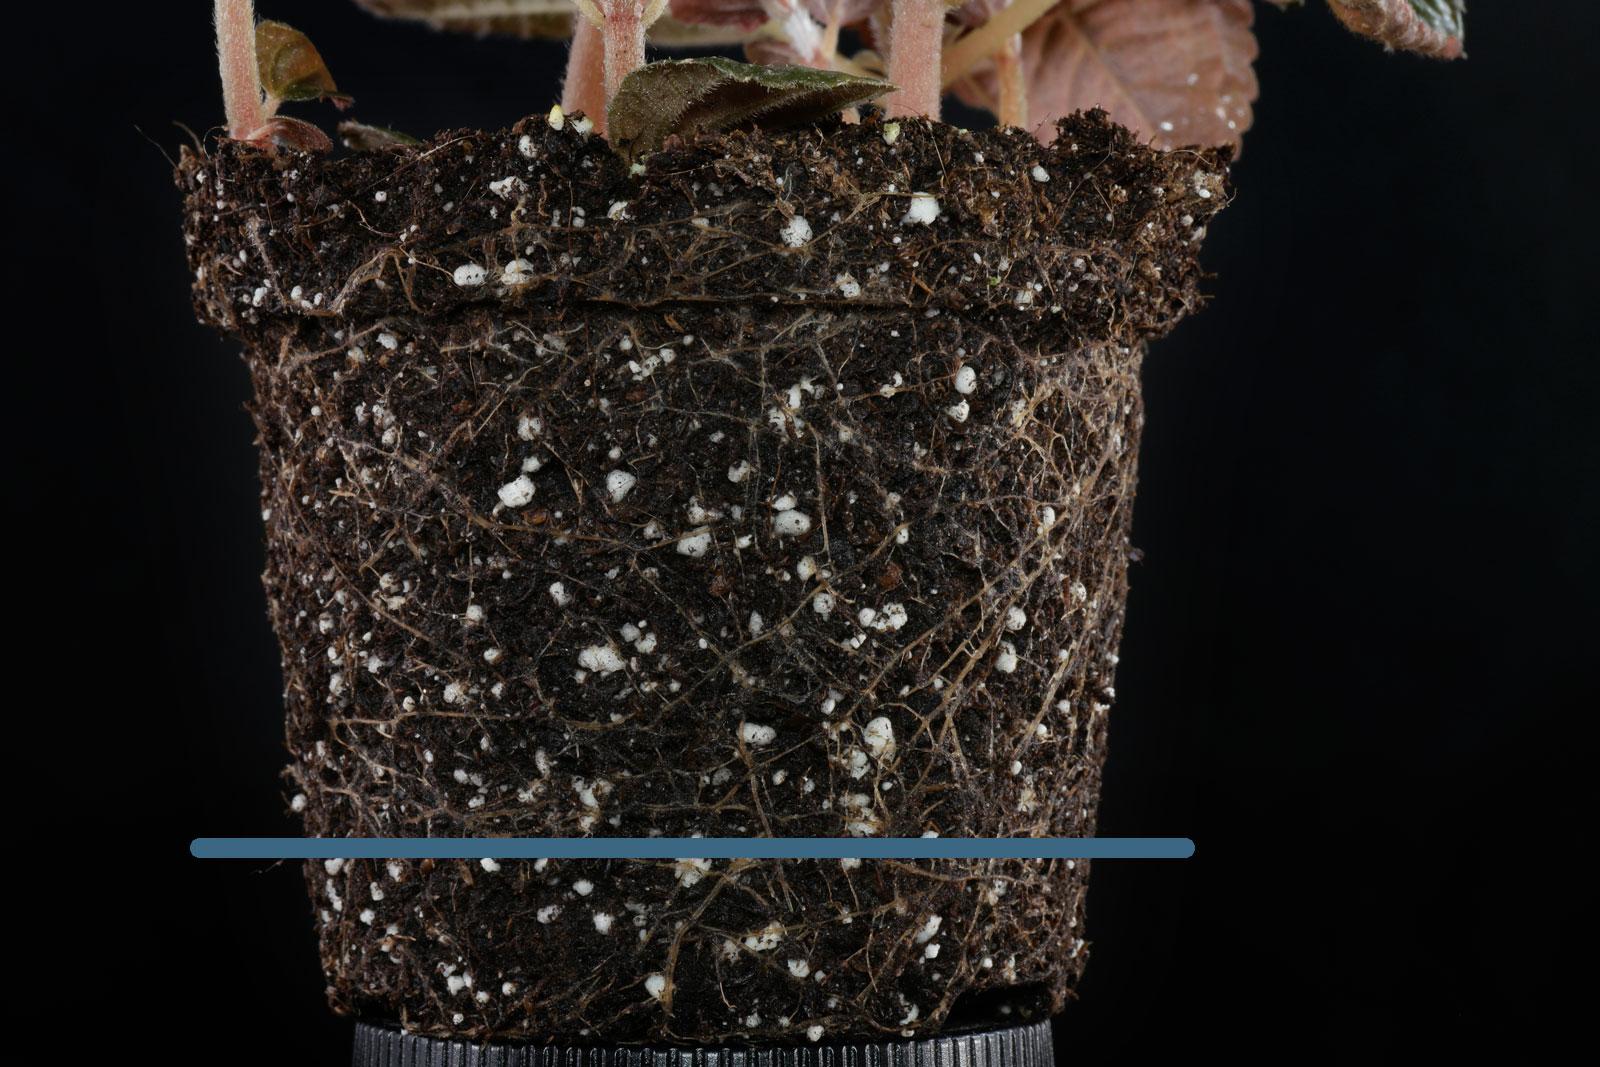 Pilea spruceana roots